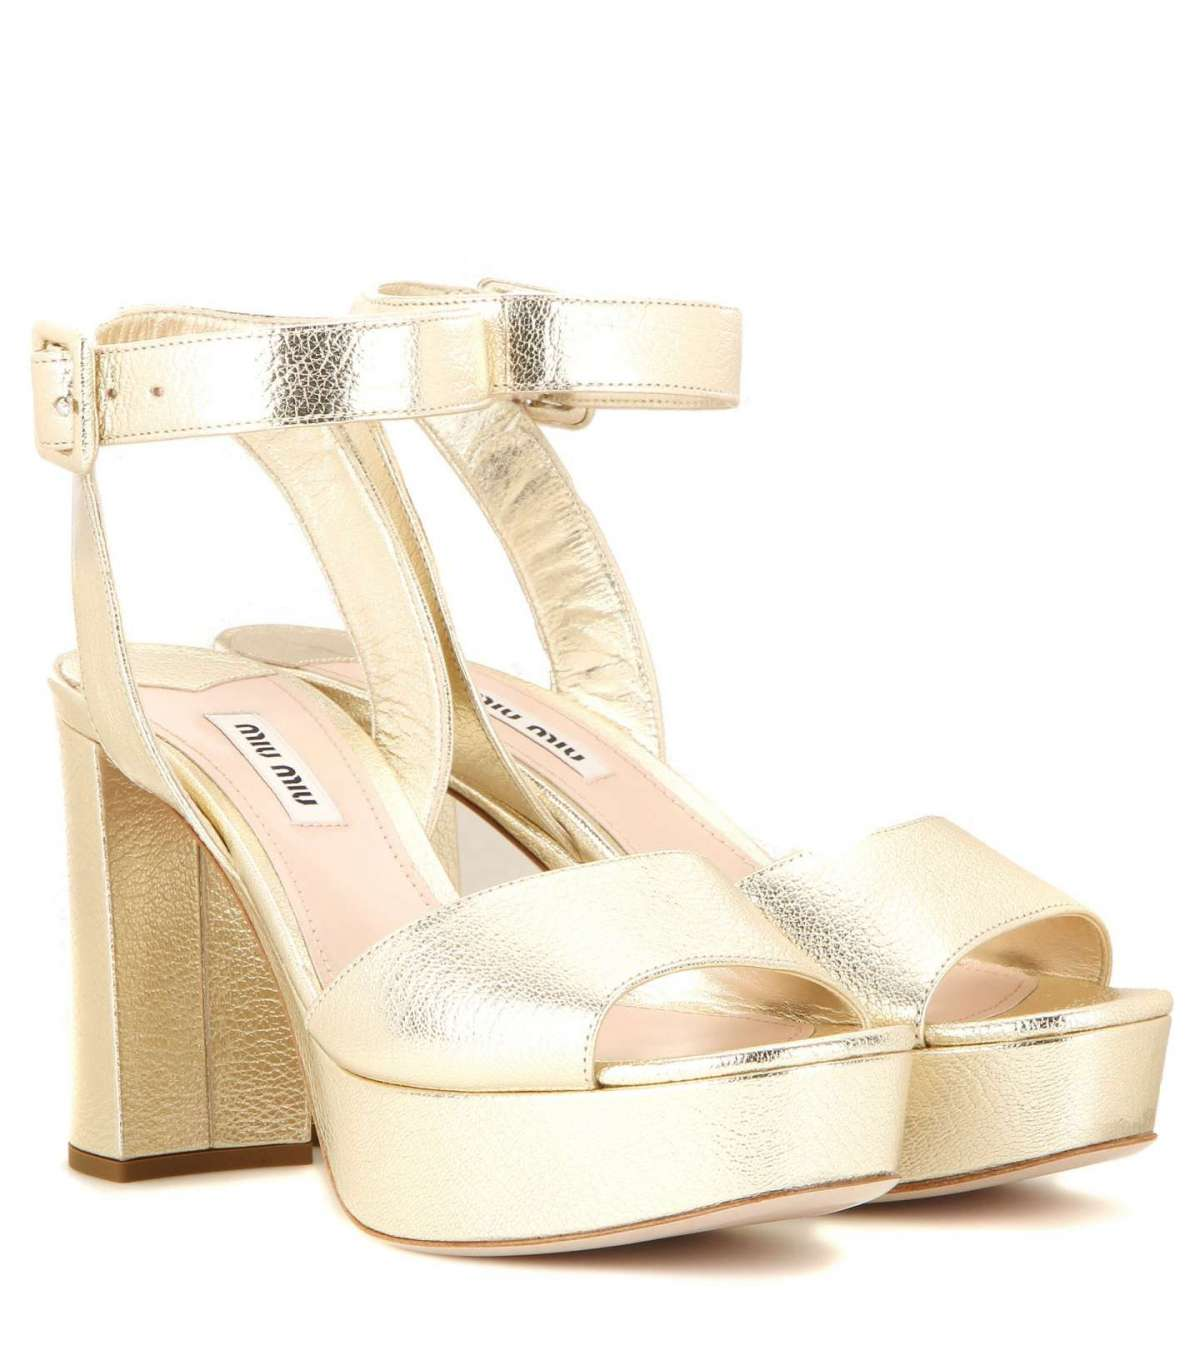 Sandali oro Miu Miu